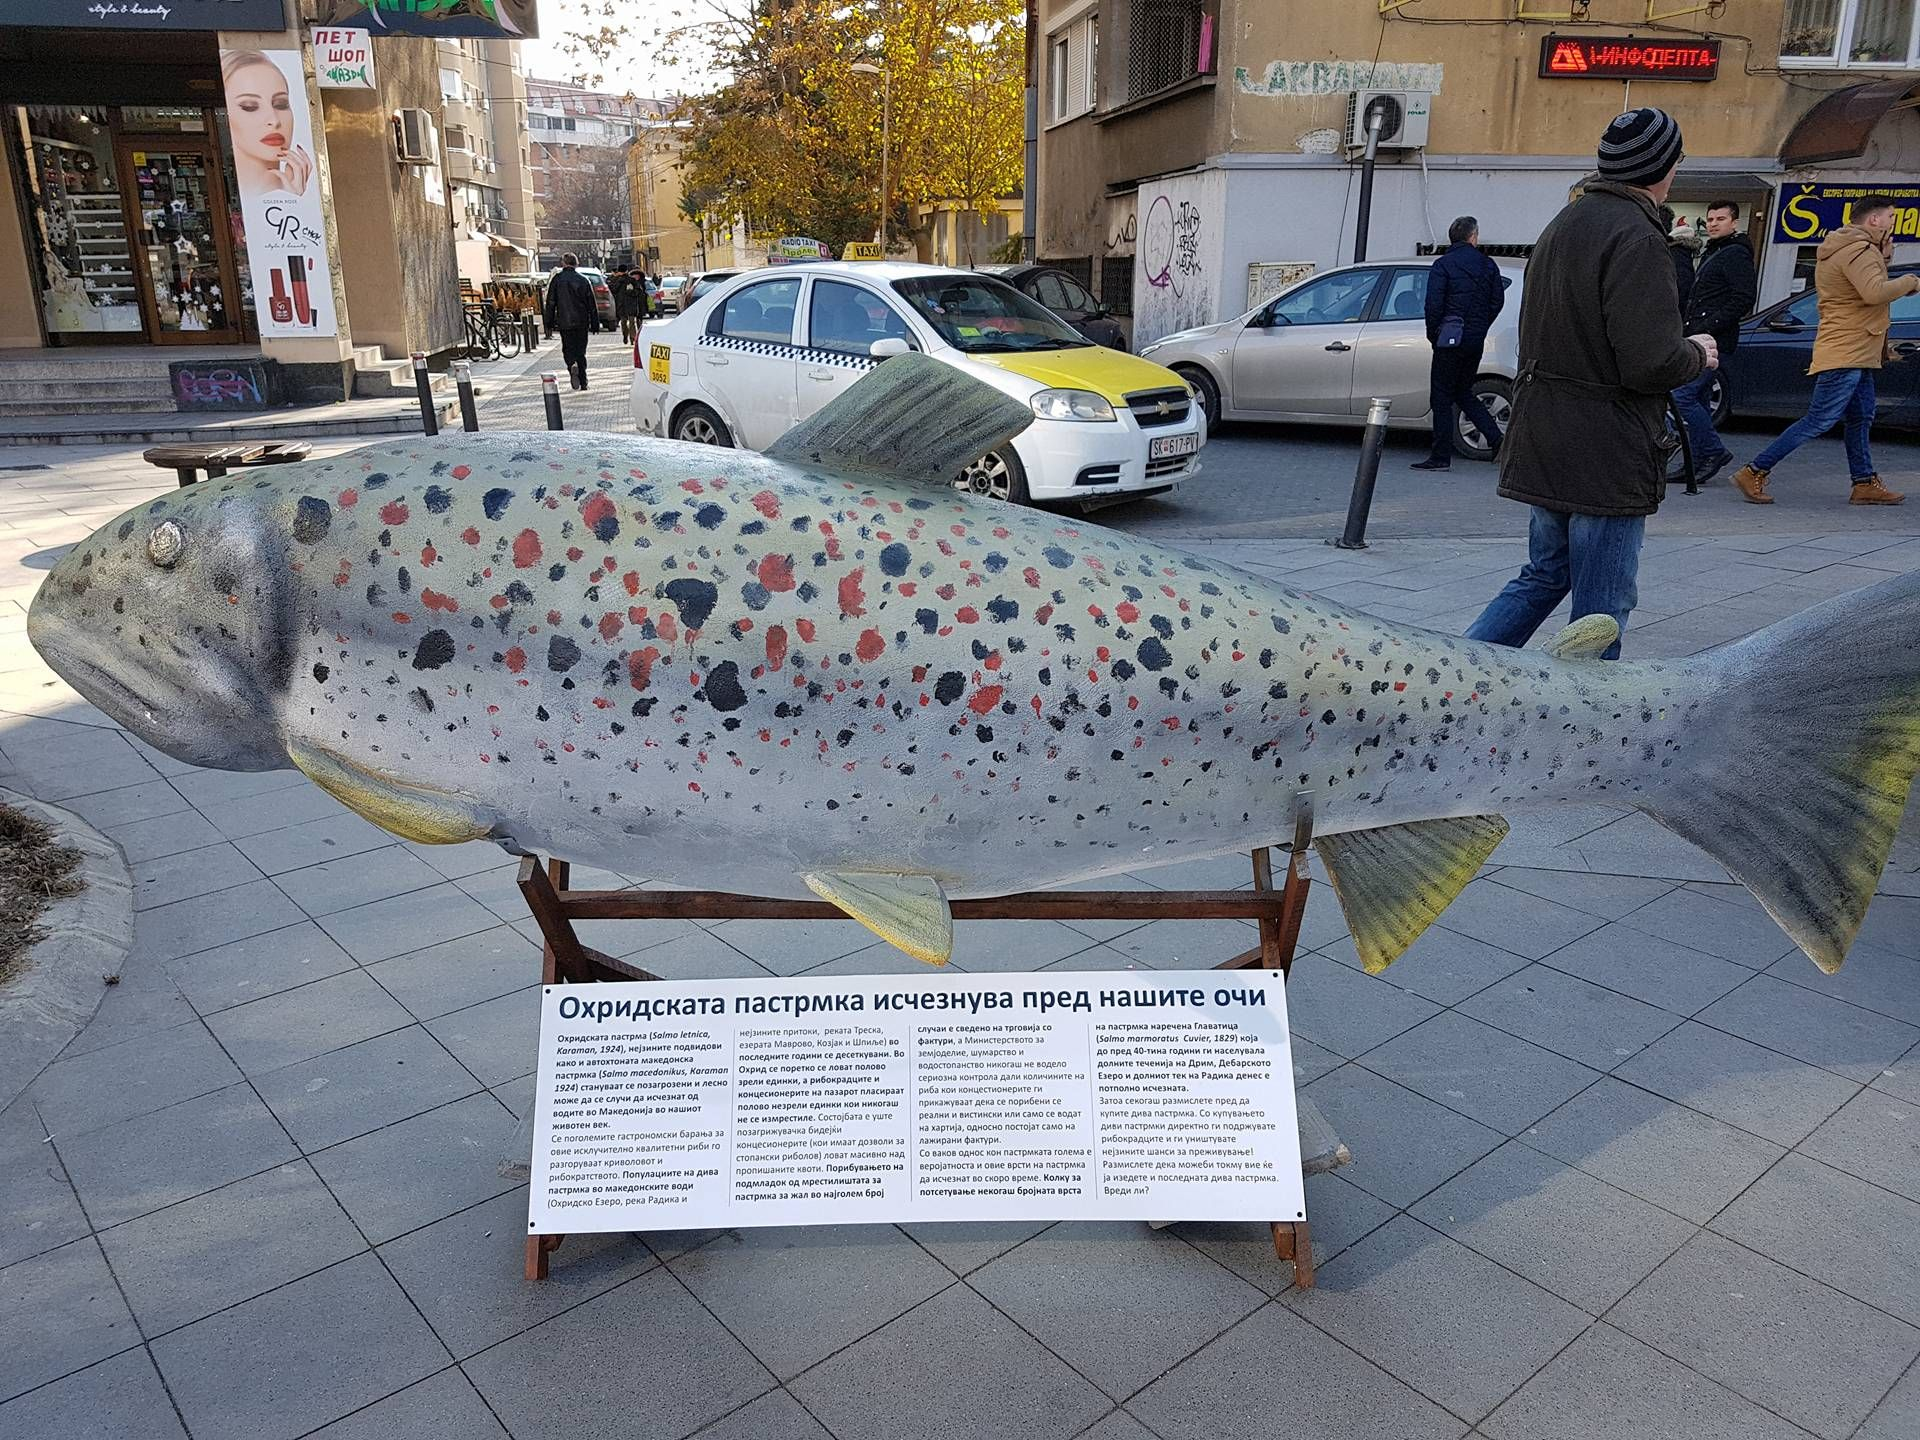 Уметничка герила акција: Џиновска пастрмка во Скопје